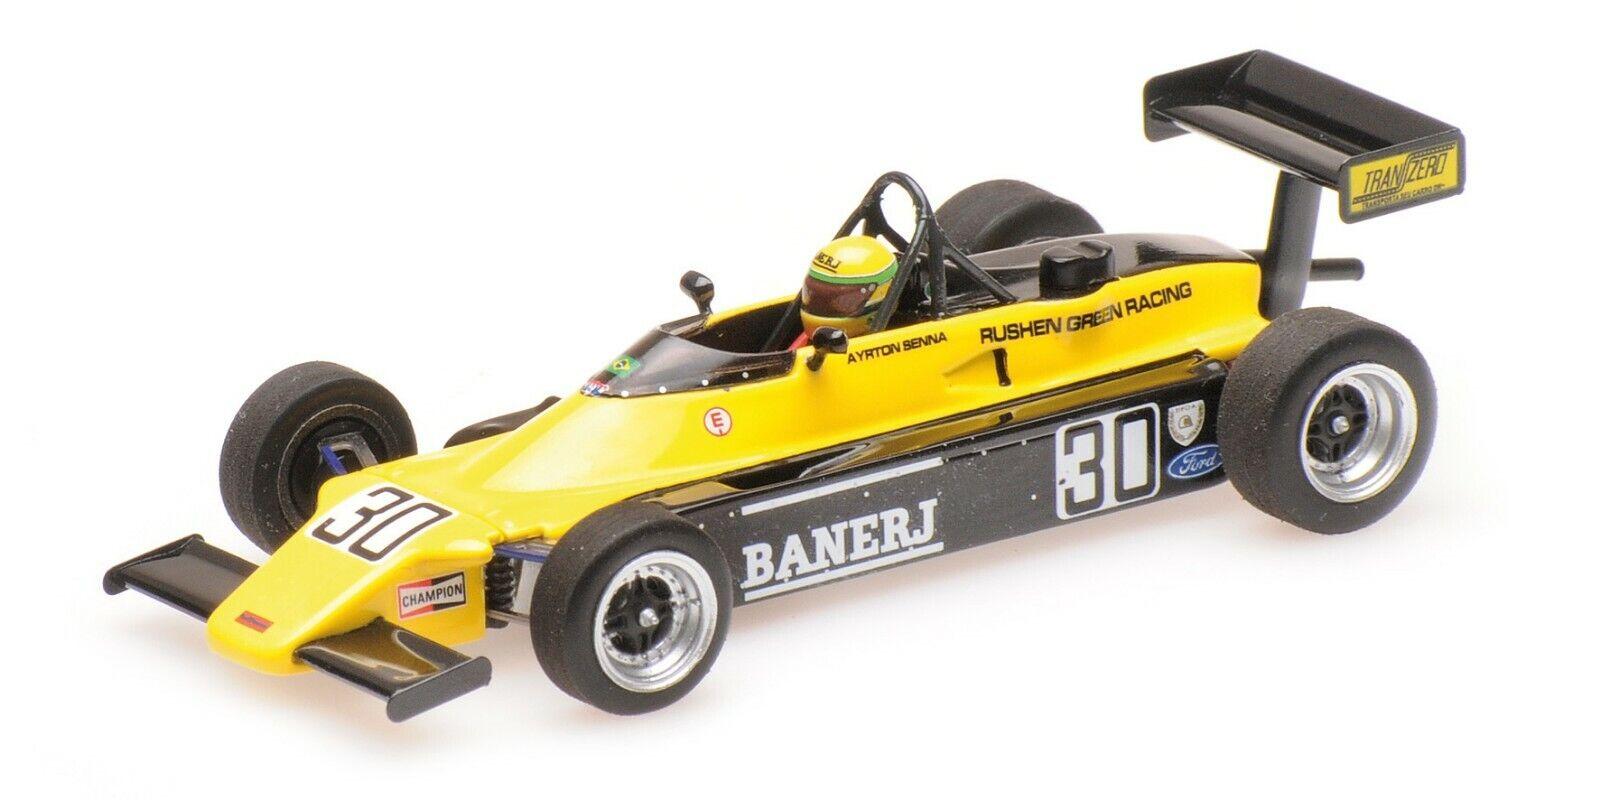 Minichamps F1 Van Diemen RF82 Ayrton Senna 1 43 Champion Rd. 8 Jyllandsring 1982